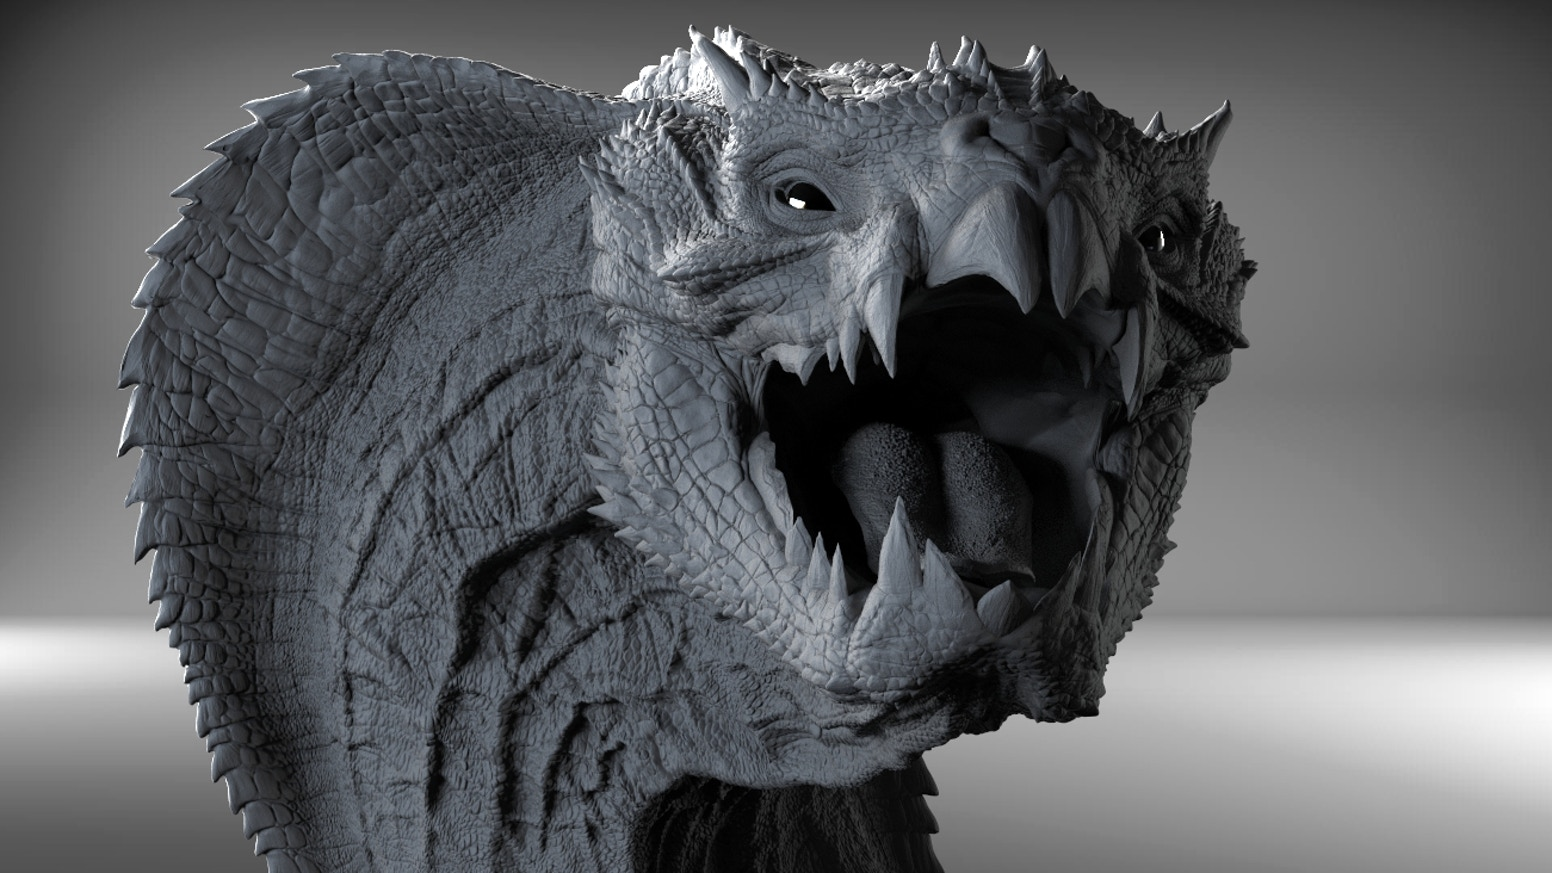 Viper Dragon 3D Printed Sculpture By Kurtis Dawe